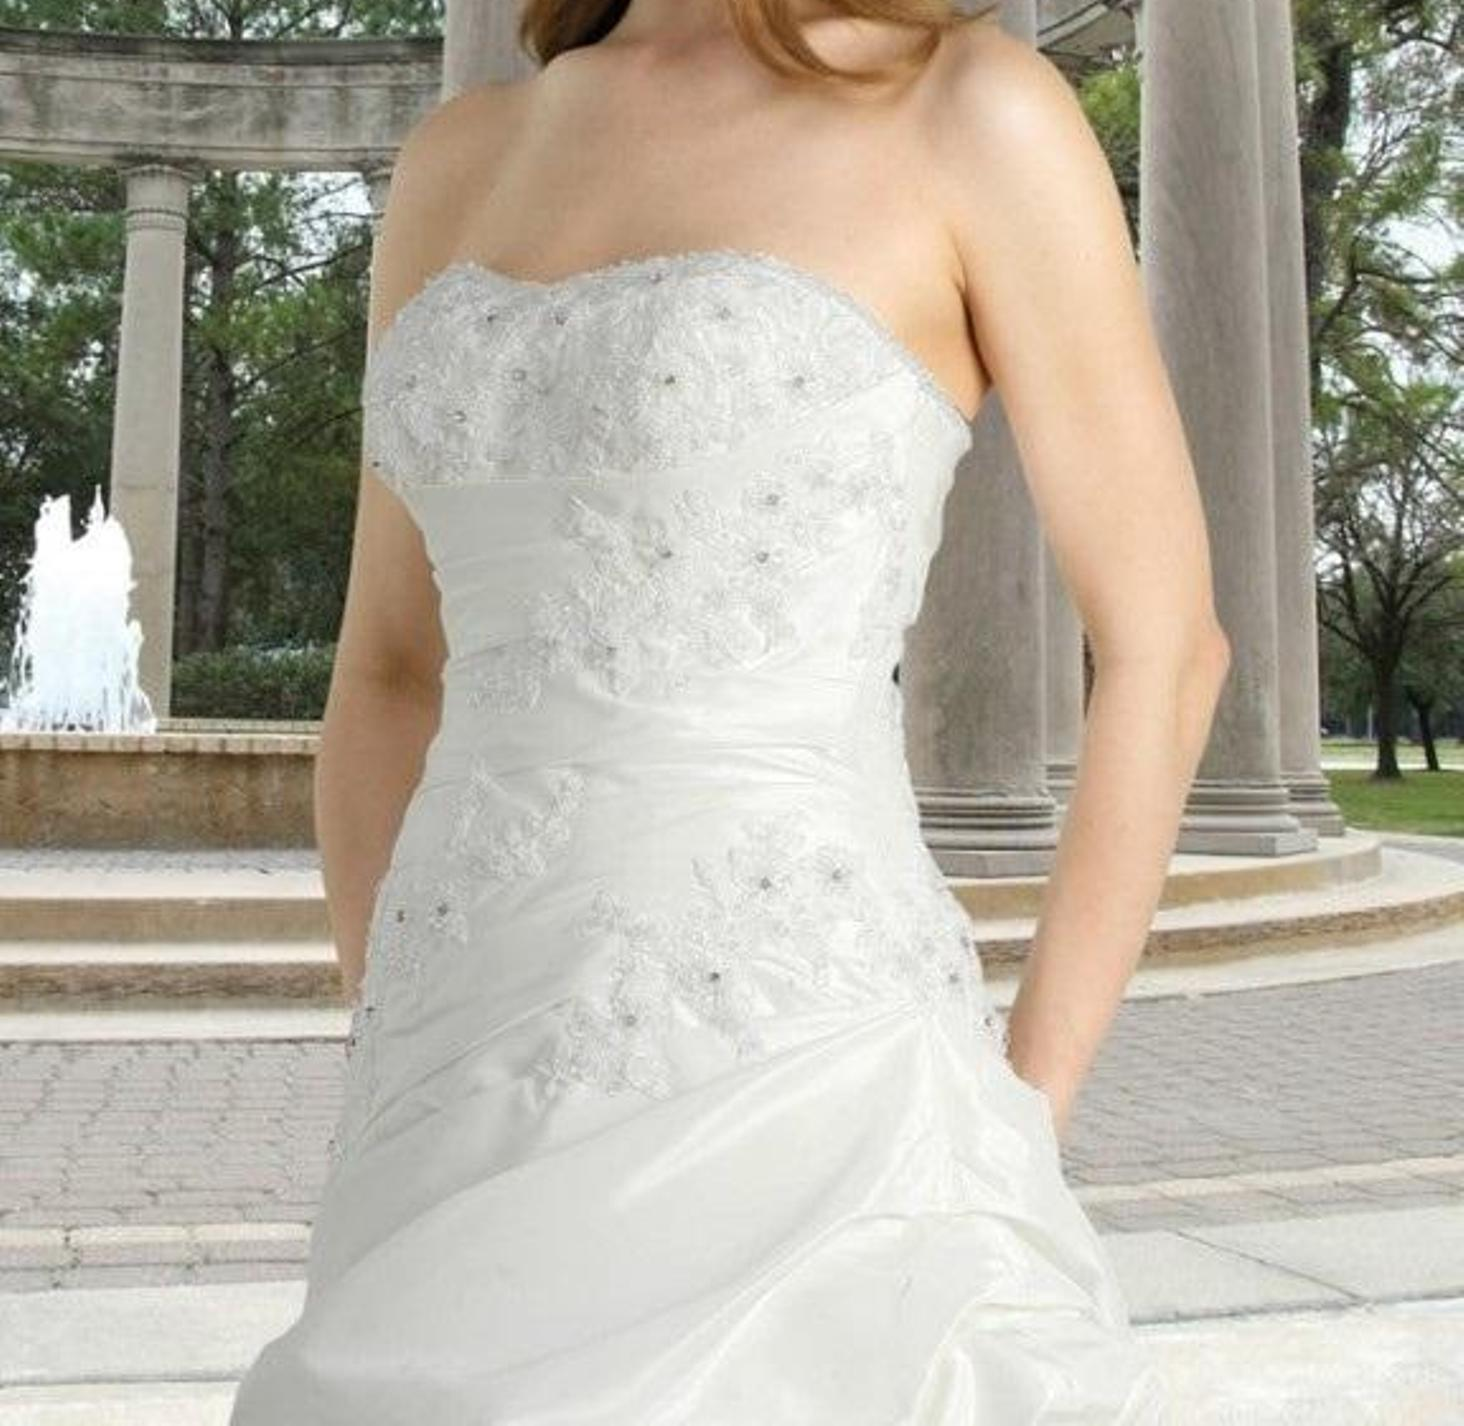 ef0947f86d3f Turmec » can you wear a sleeveless dress to a catholic church